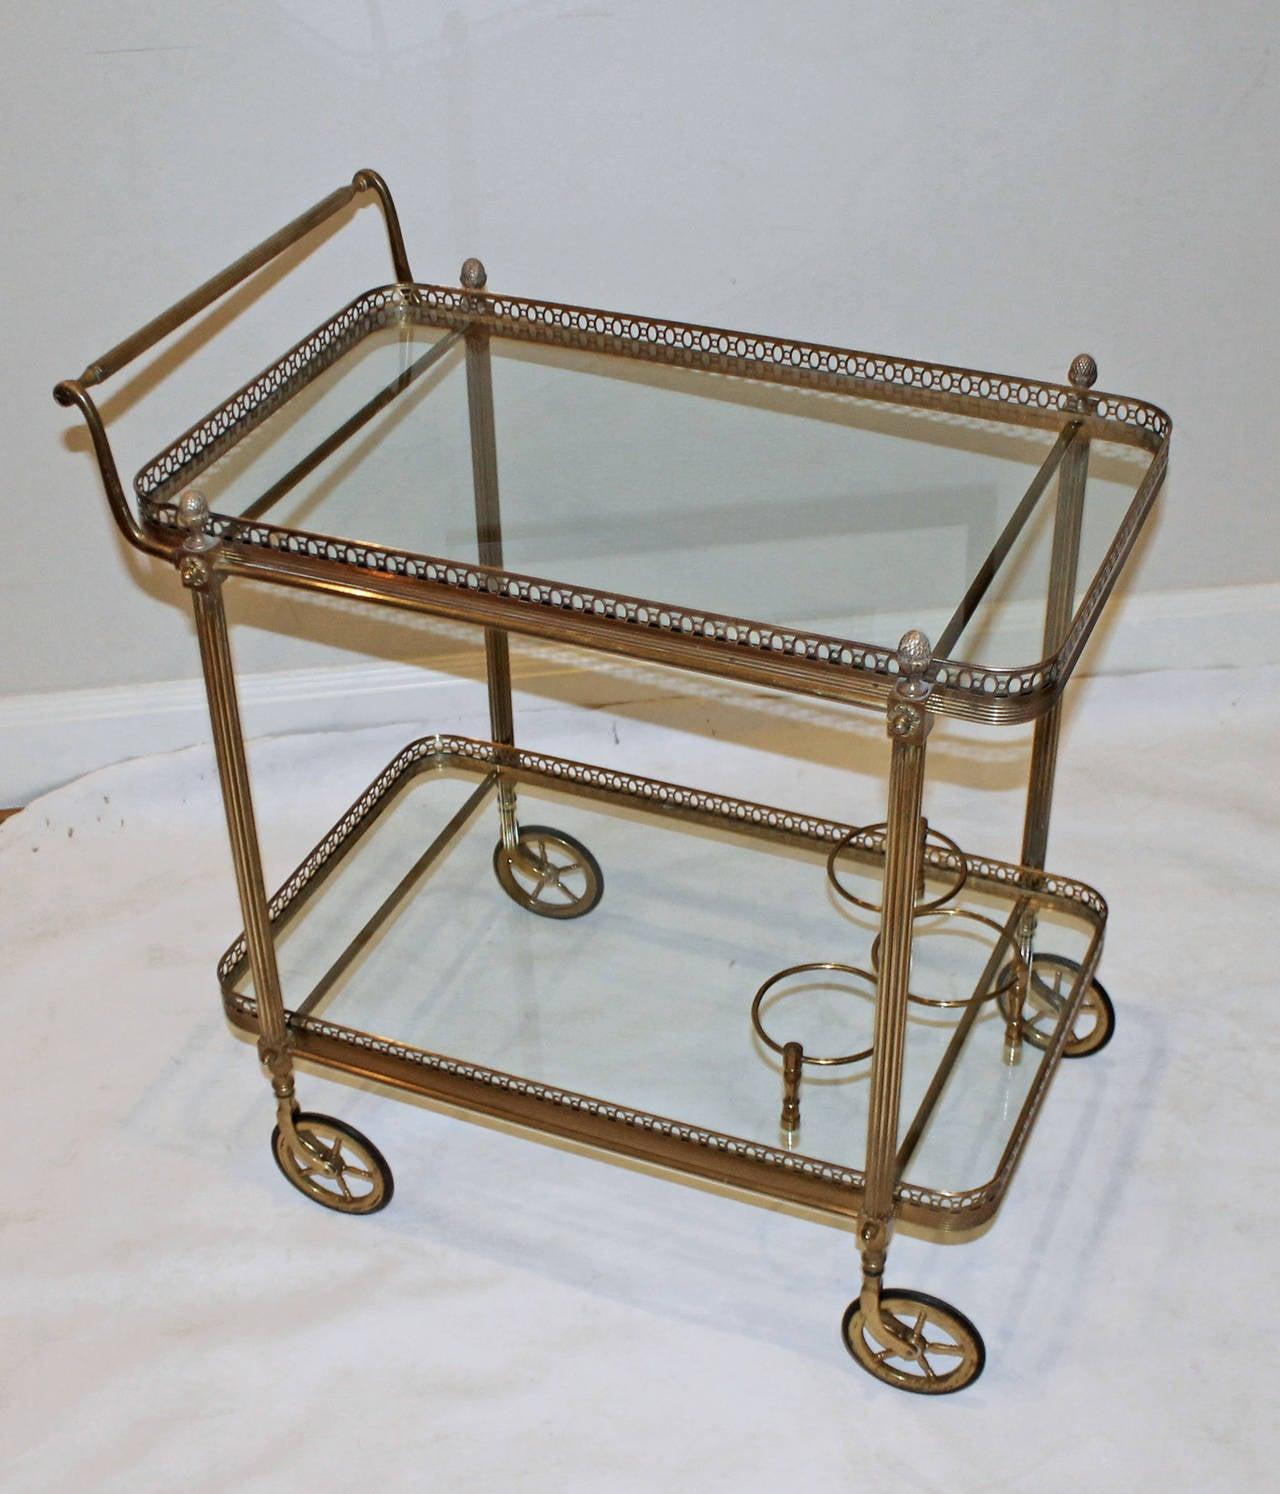 french neoclassic vintage brass bar cart at 1stdibs. Black Bedroom Furniture Sets. Home Design Ideas